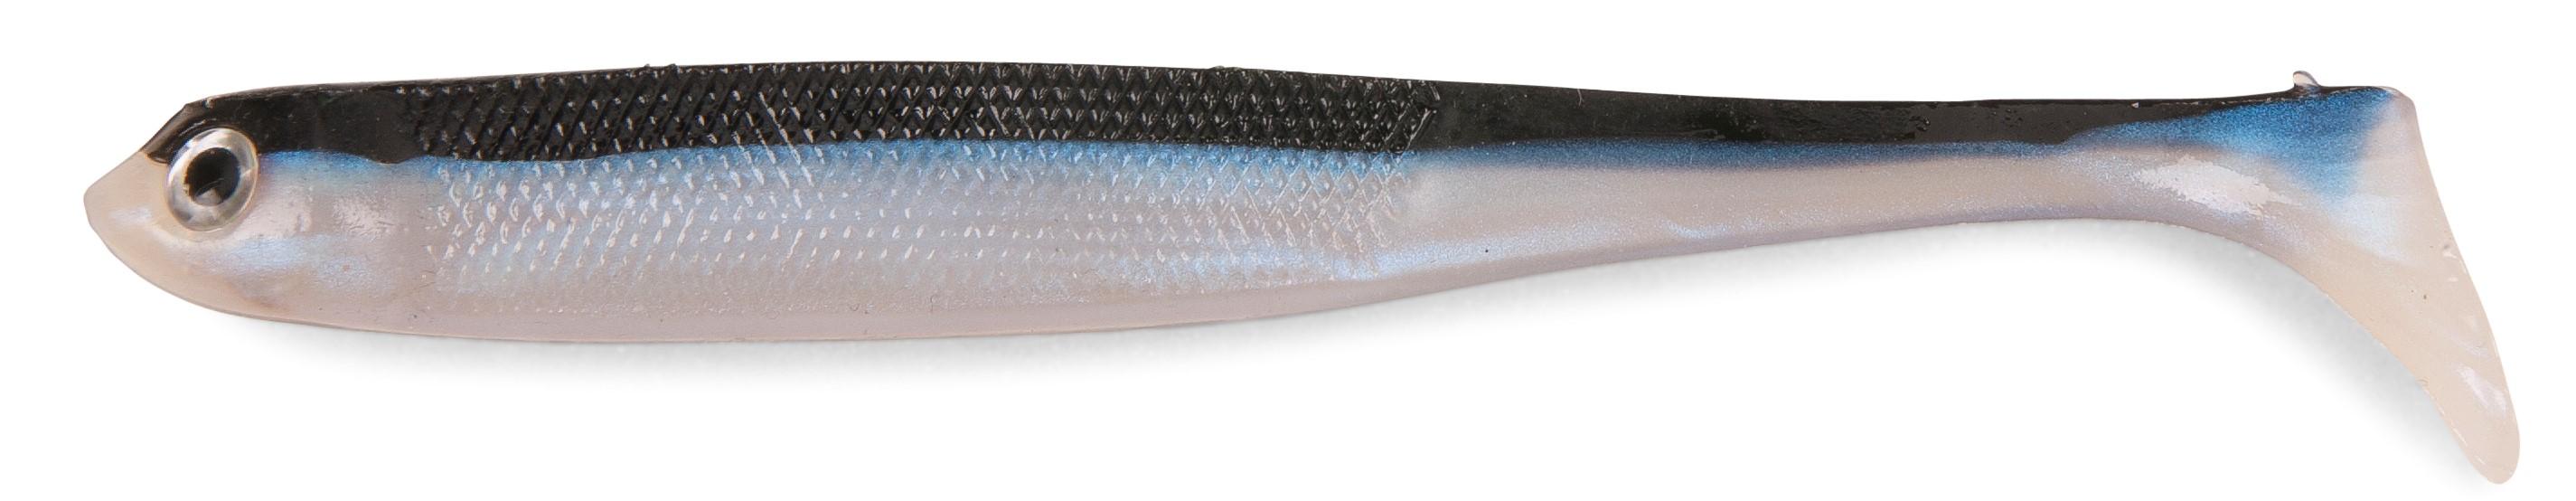 Iron Claw gumová nástraha Slim Jim 10 cm Vzor HR, 3 ks